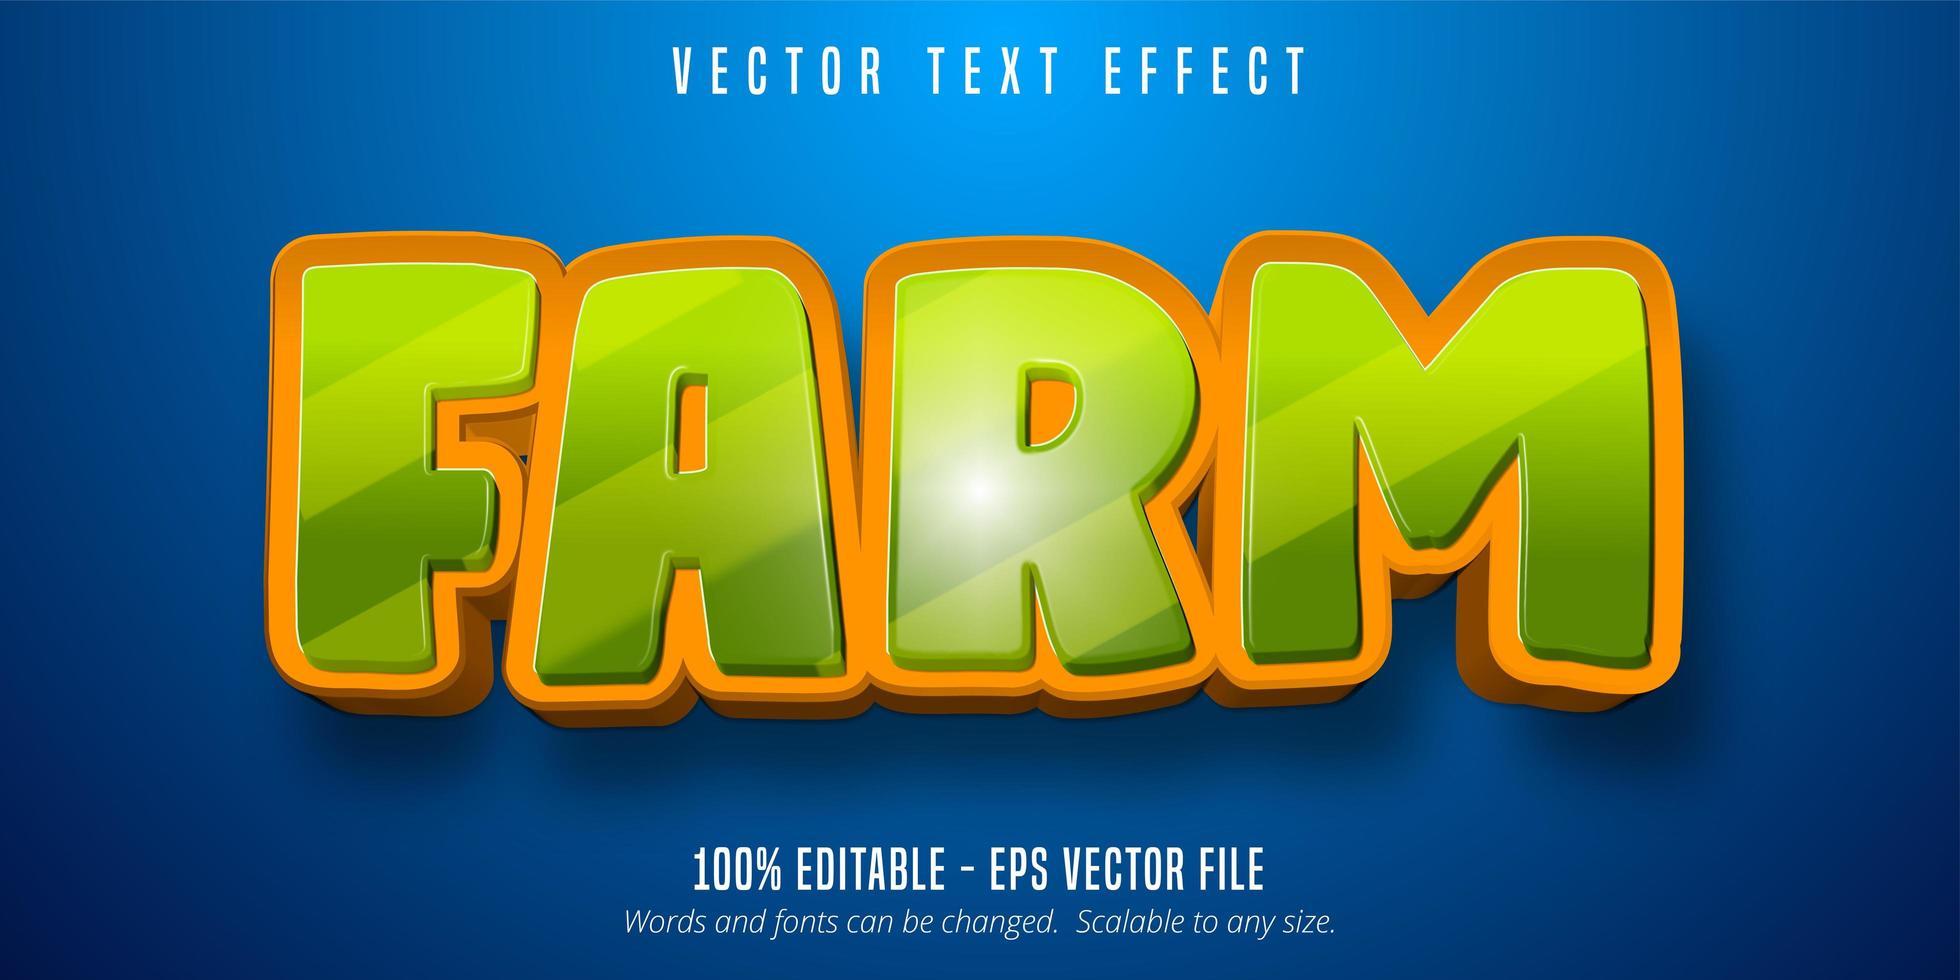 bearbeitbarer Texteffekt im Farm-Cartoon-Stil vektor